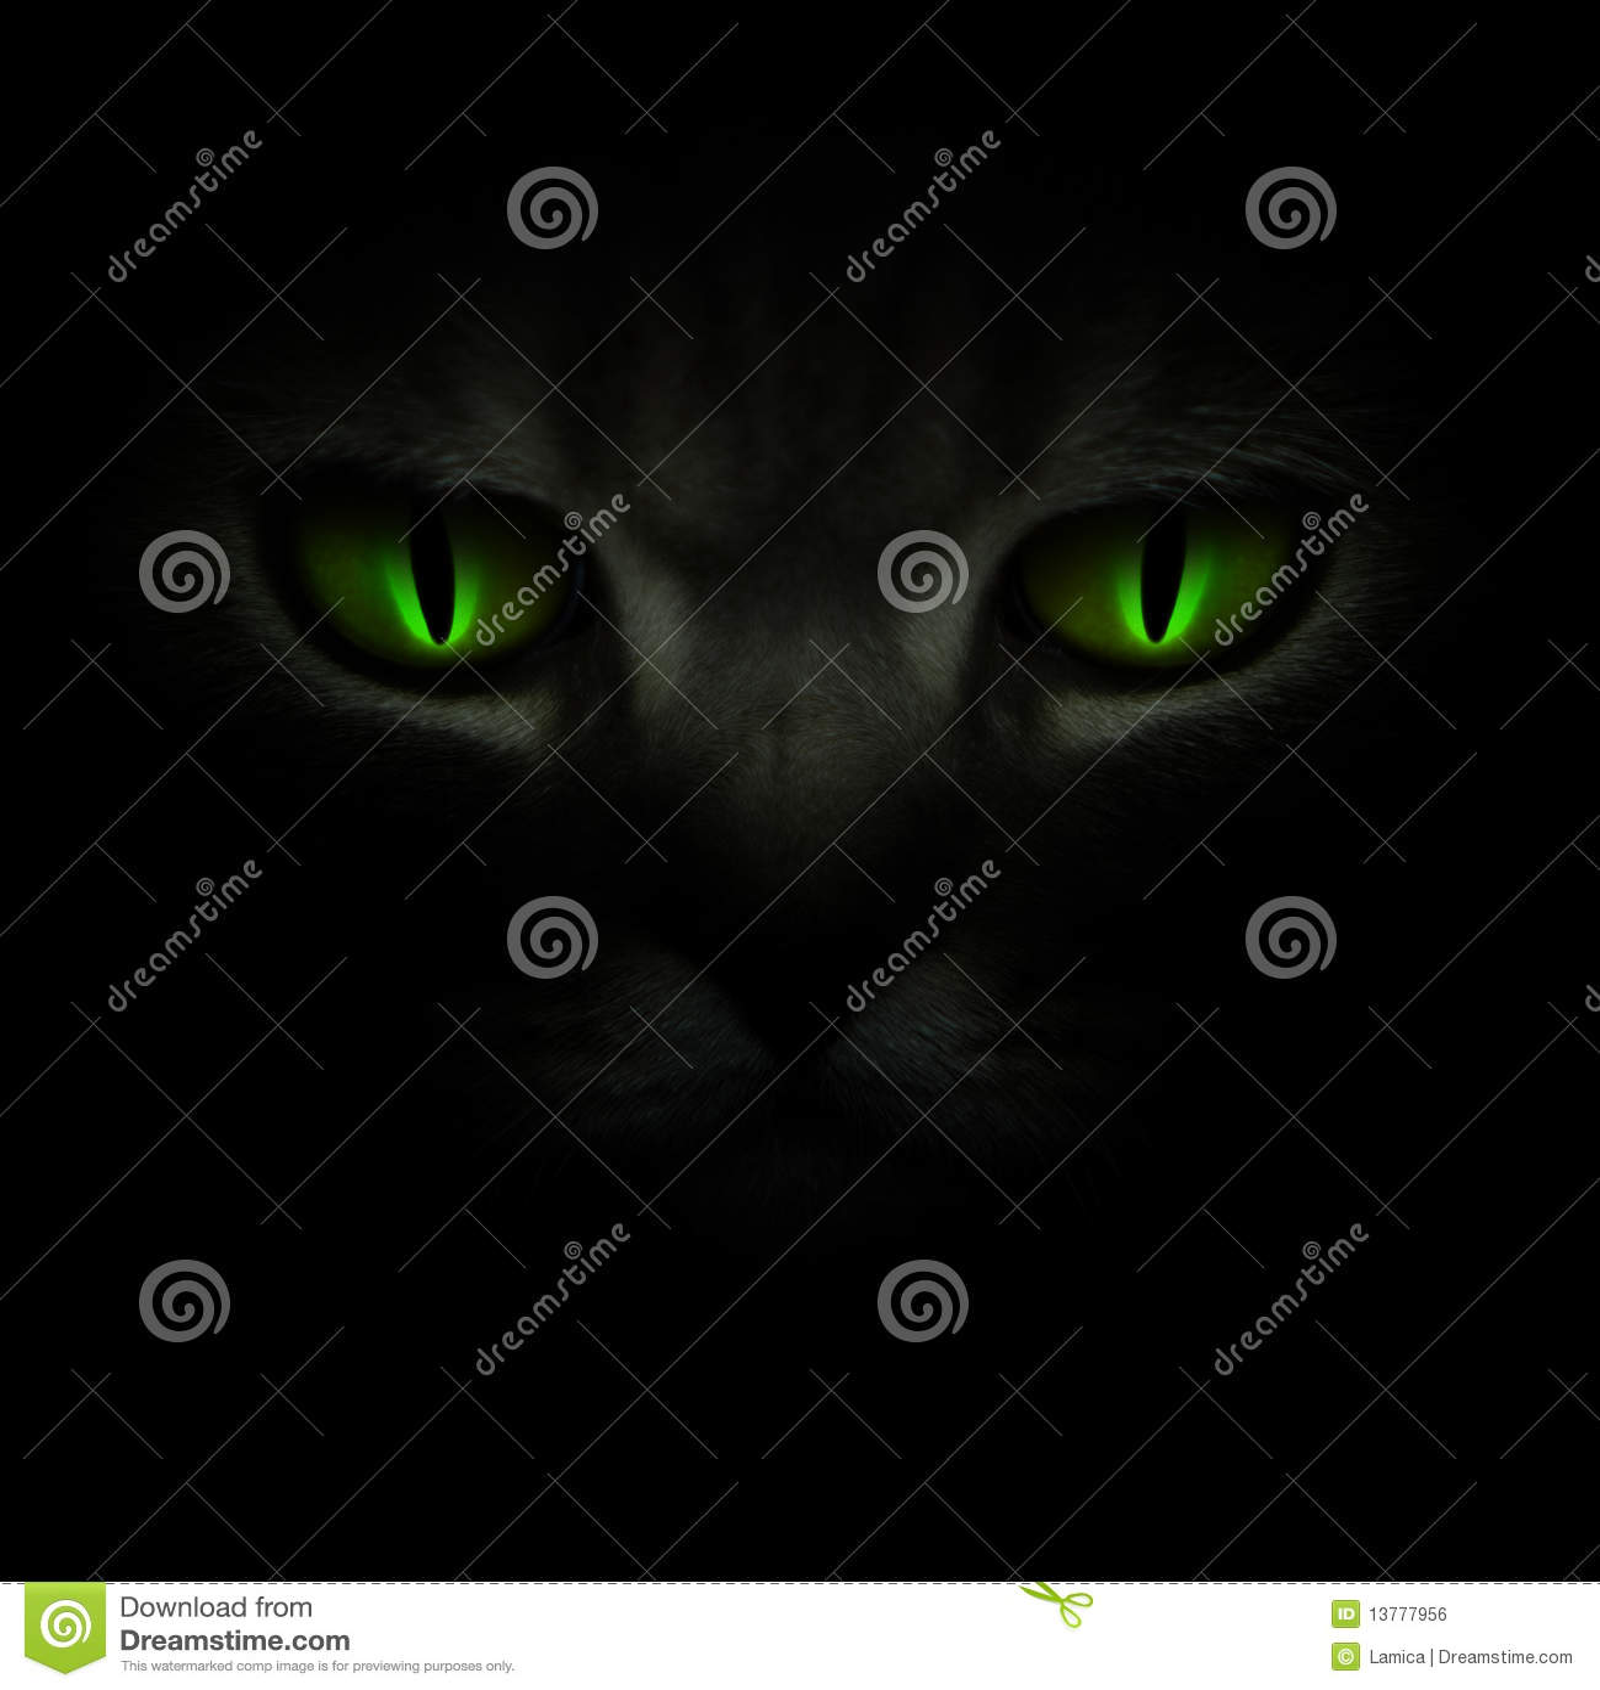 Green cat s eyes glowing in the dark